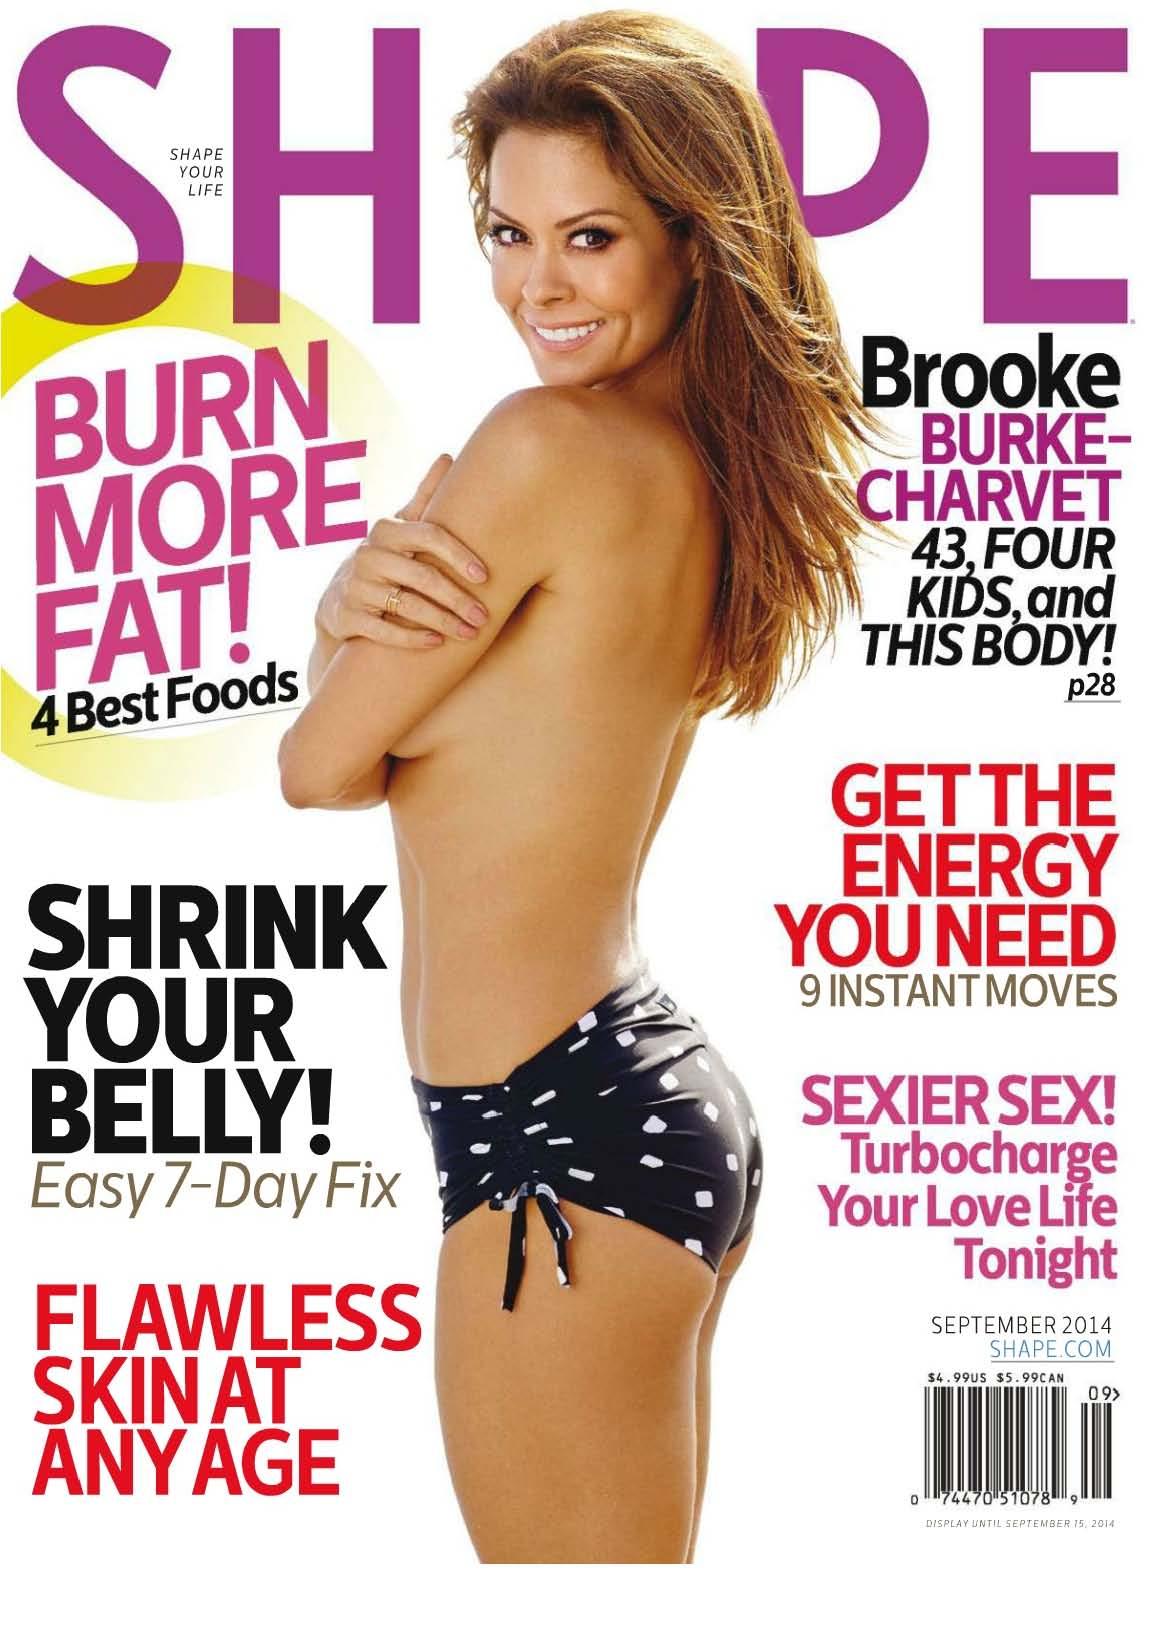 Brooke Burke Nude2 (13)